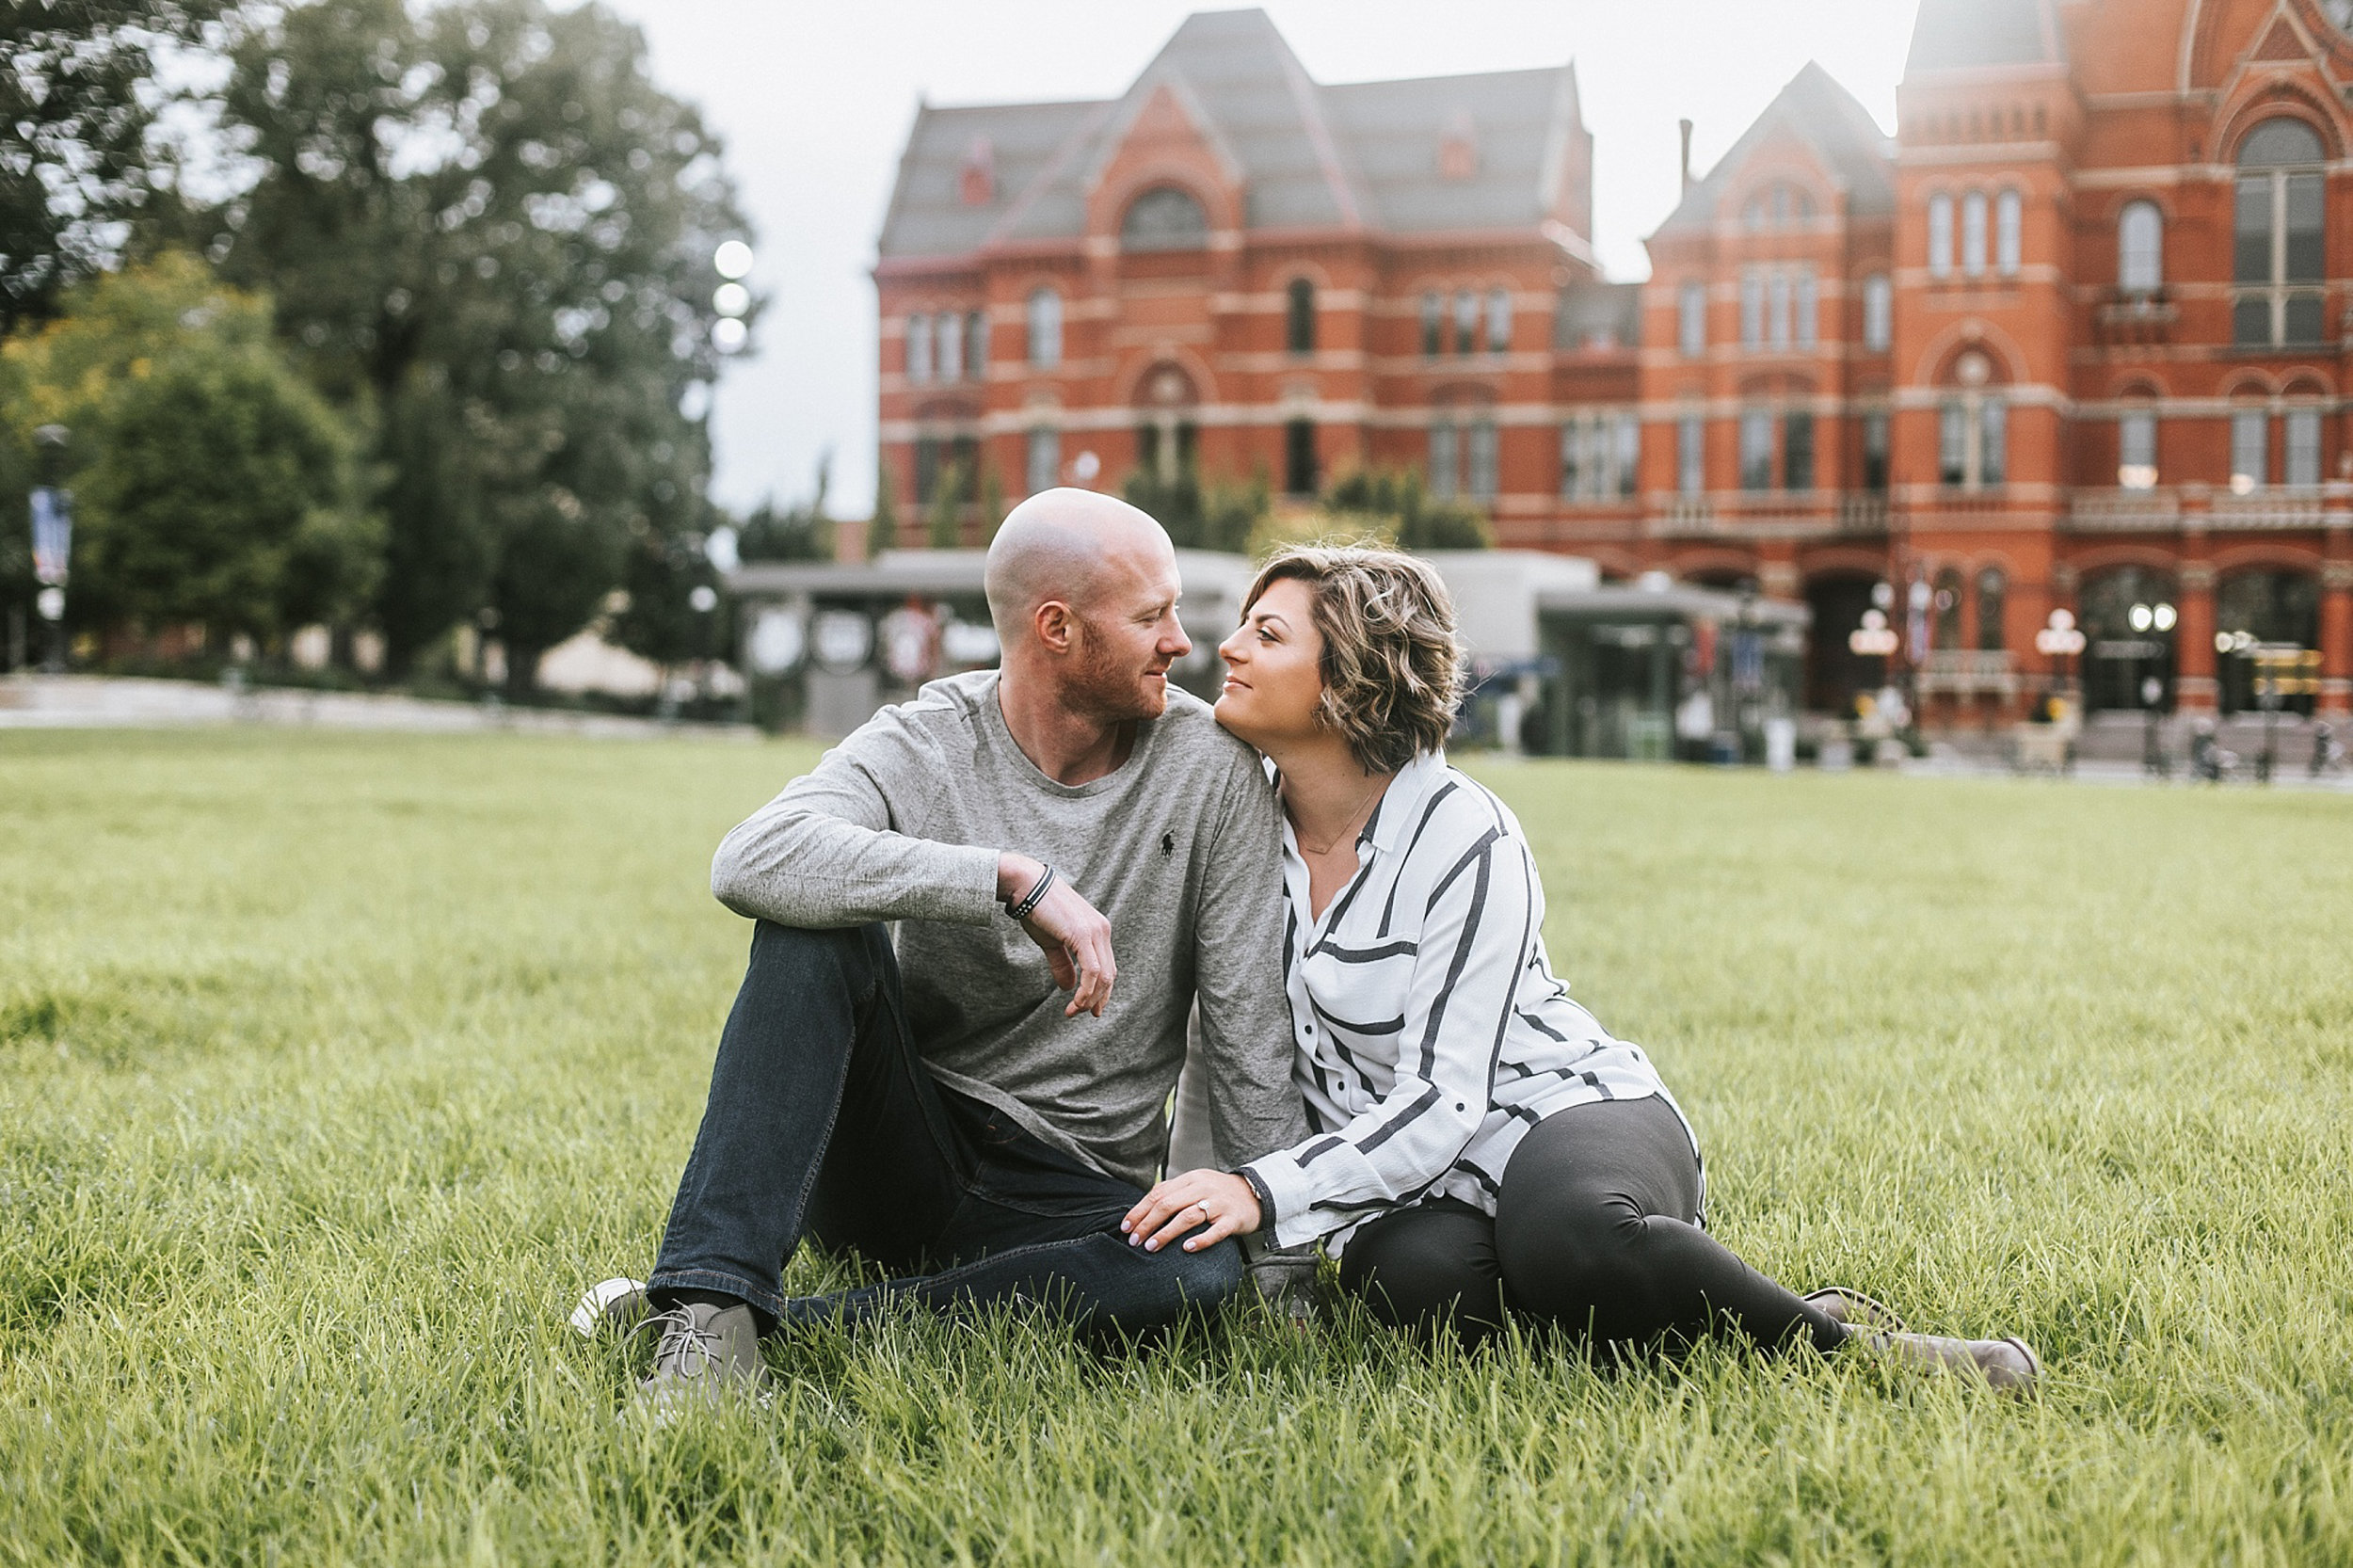 Brooke Townsend Photography - Ohio Wedding Photographer-24.jpg